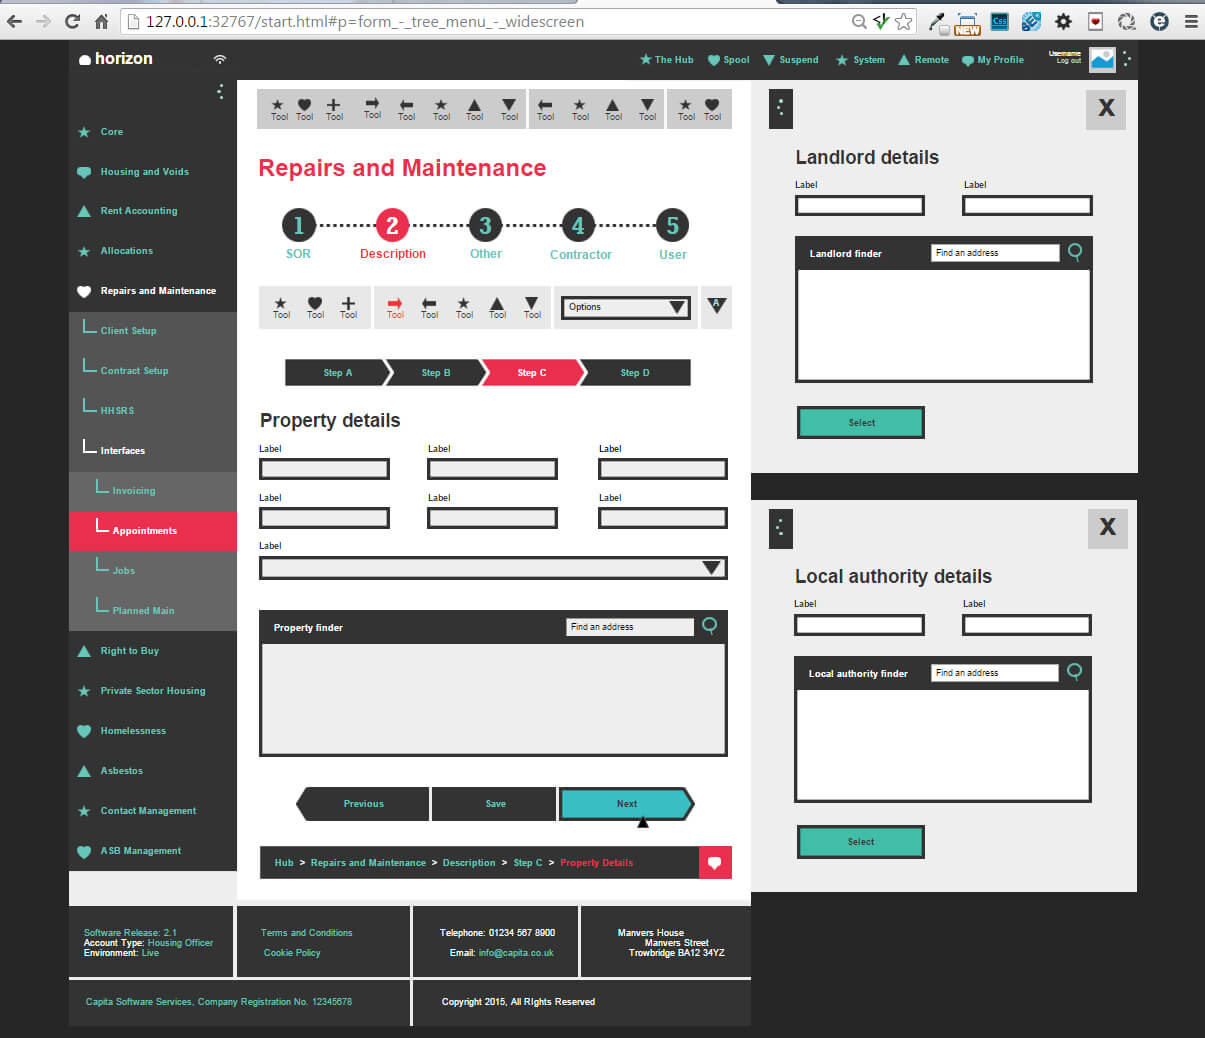 Horizon-UI-Concepts-Form-ExtendedControls